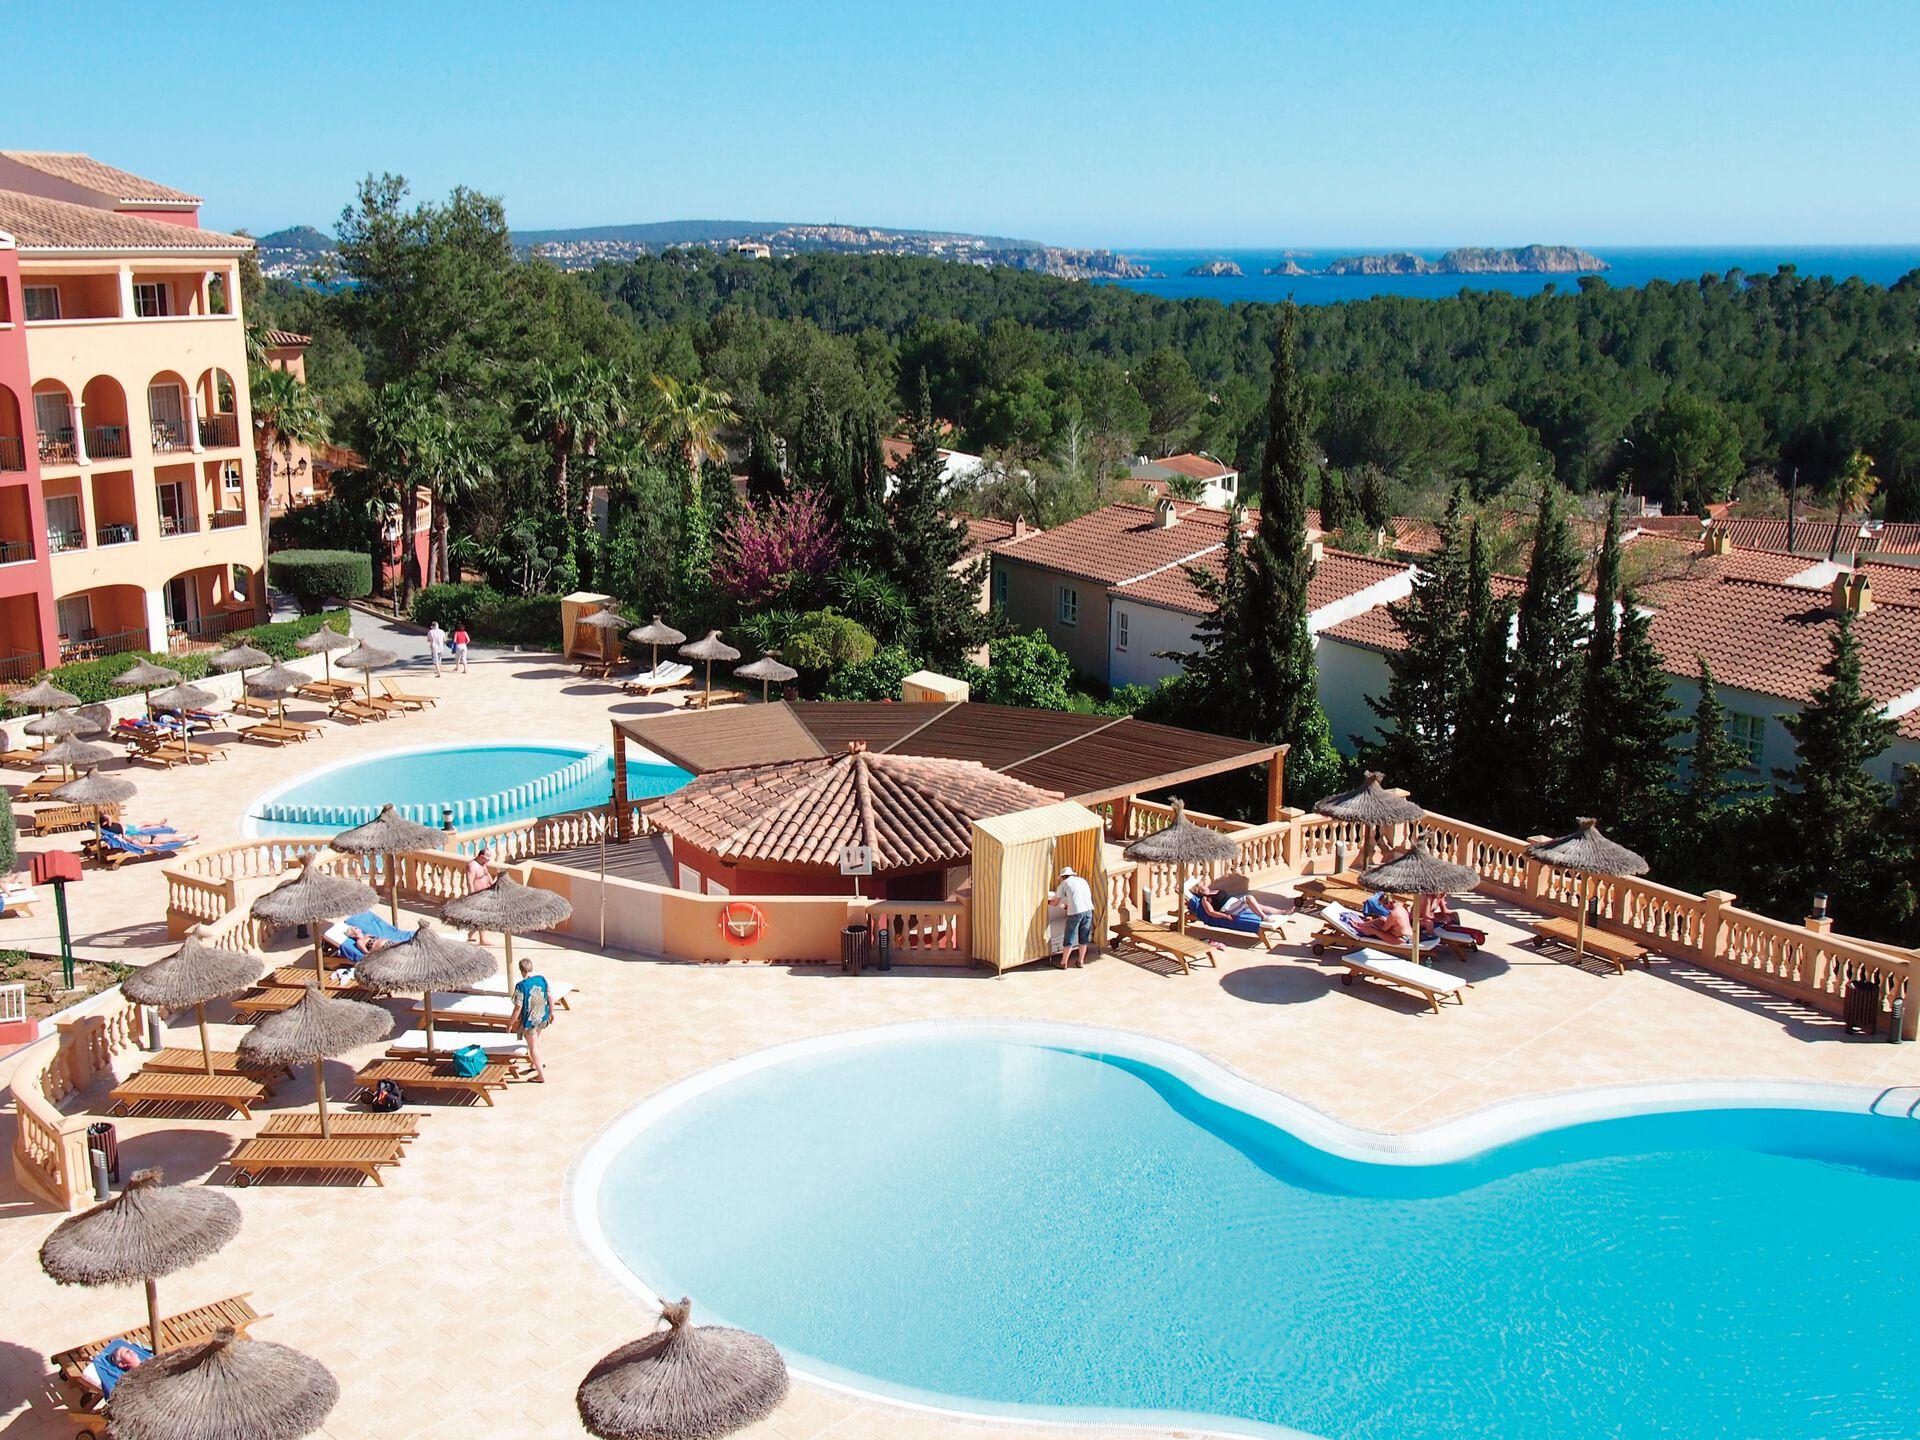 Séjour Espagne - Hotel Don Antonio - 4*